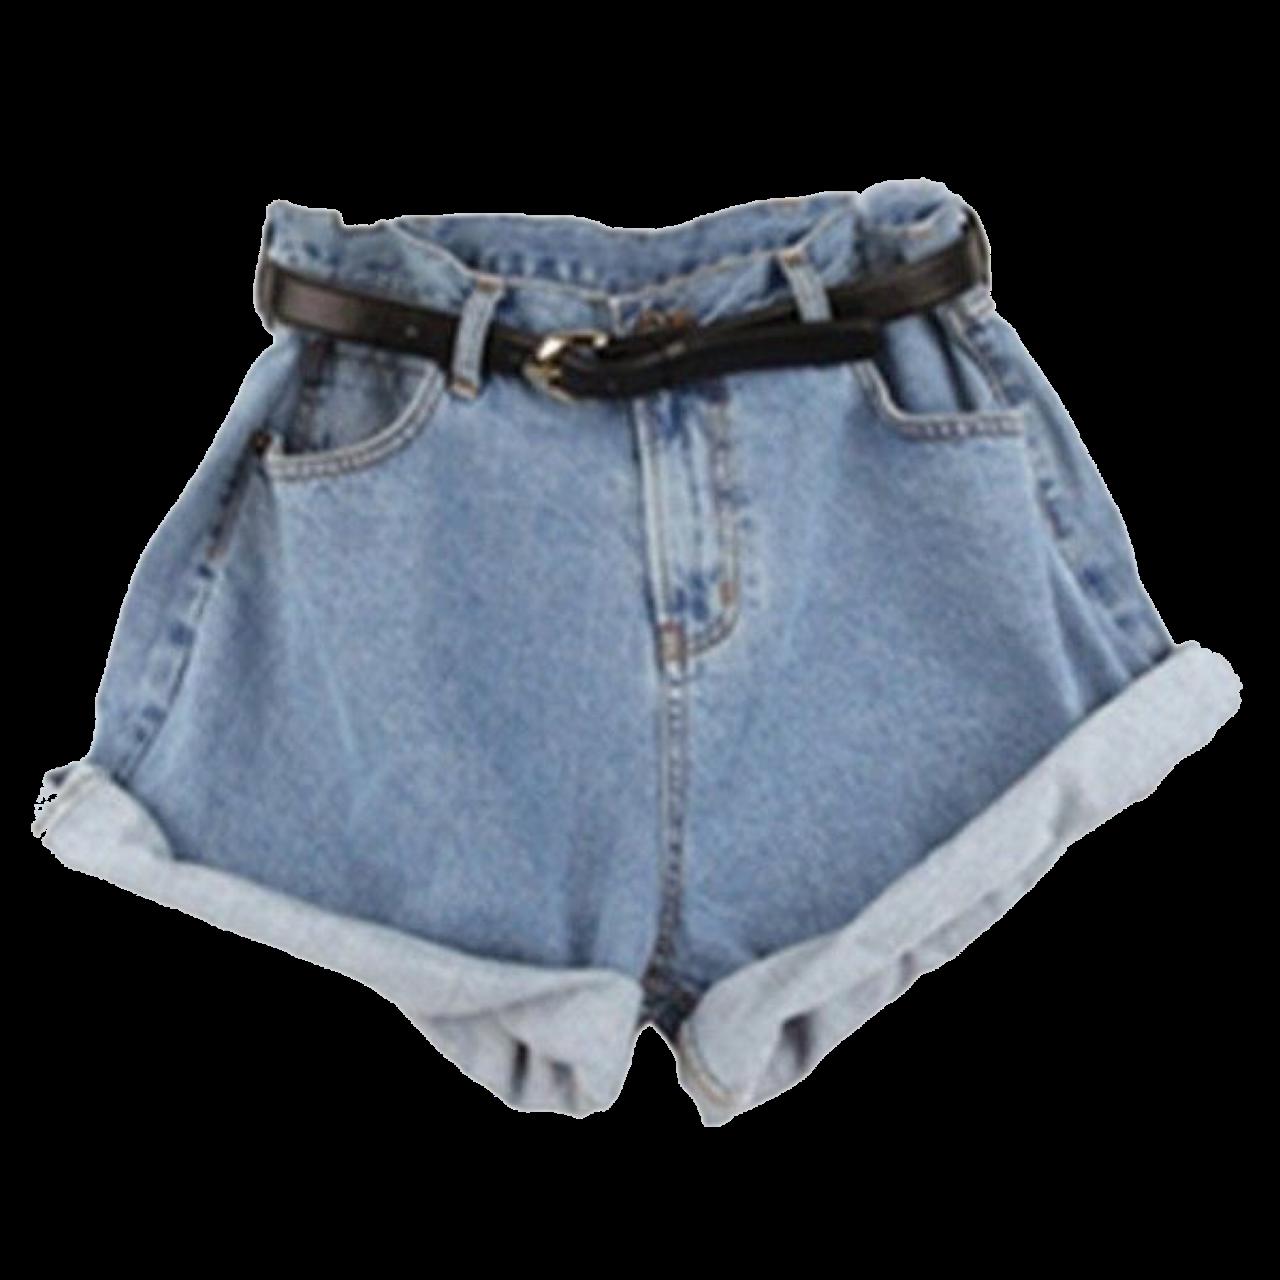 26424484a8 High Wasted Shorts Outfit, 90s Shorts, Retro Shorts, High Rise Shorts, Short